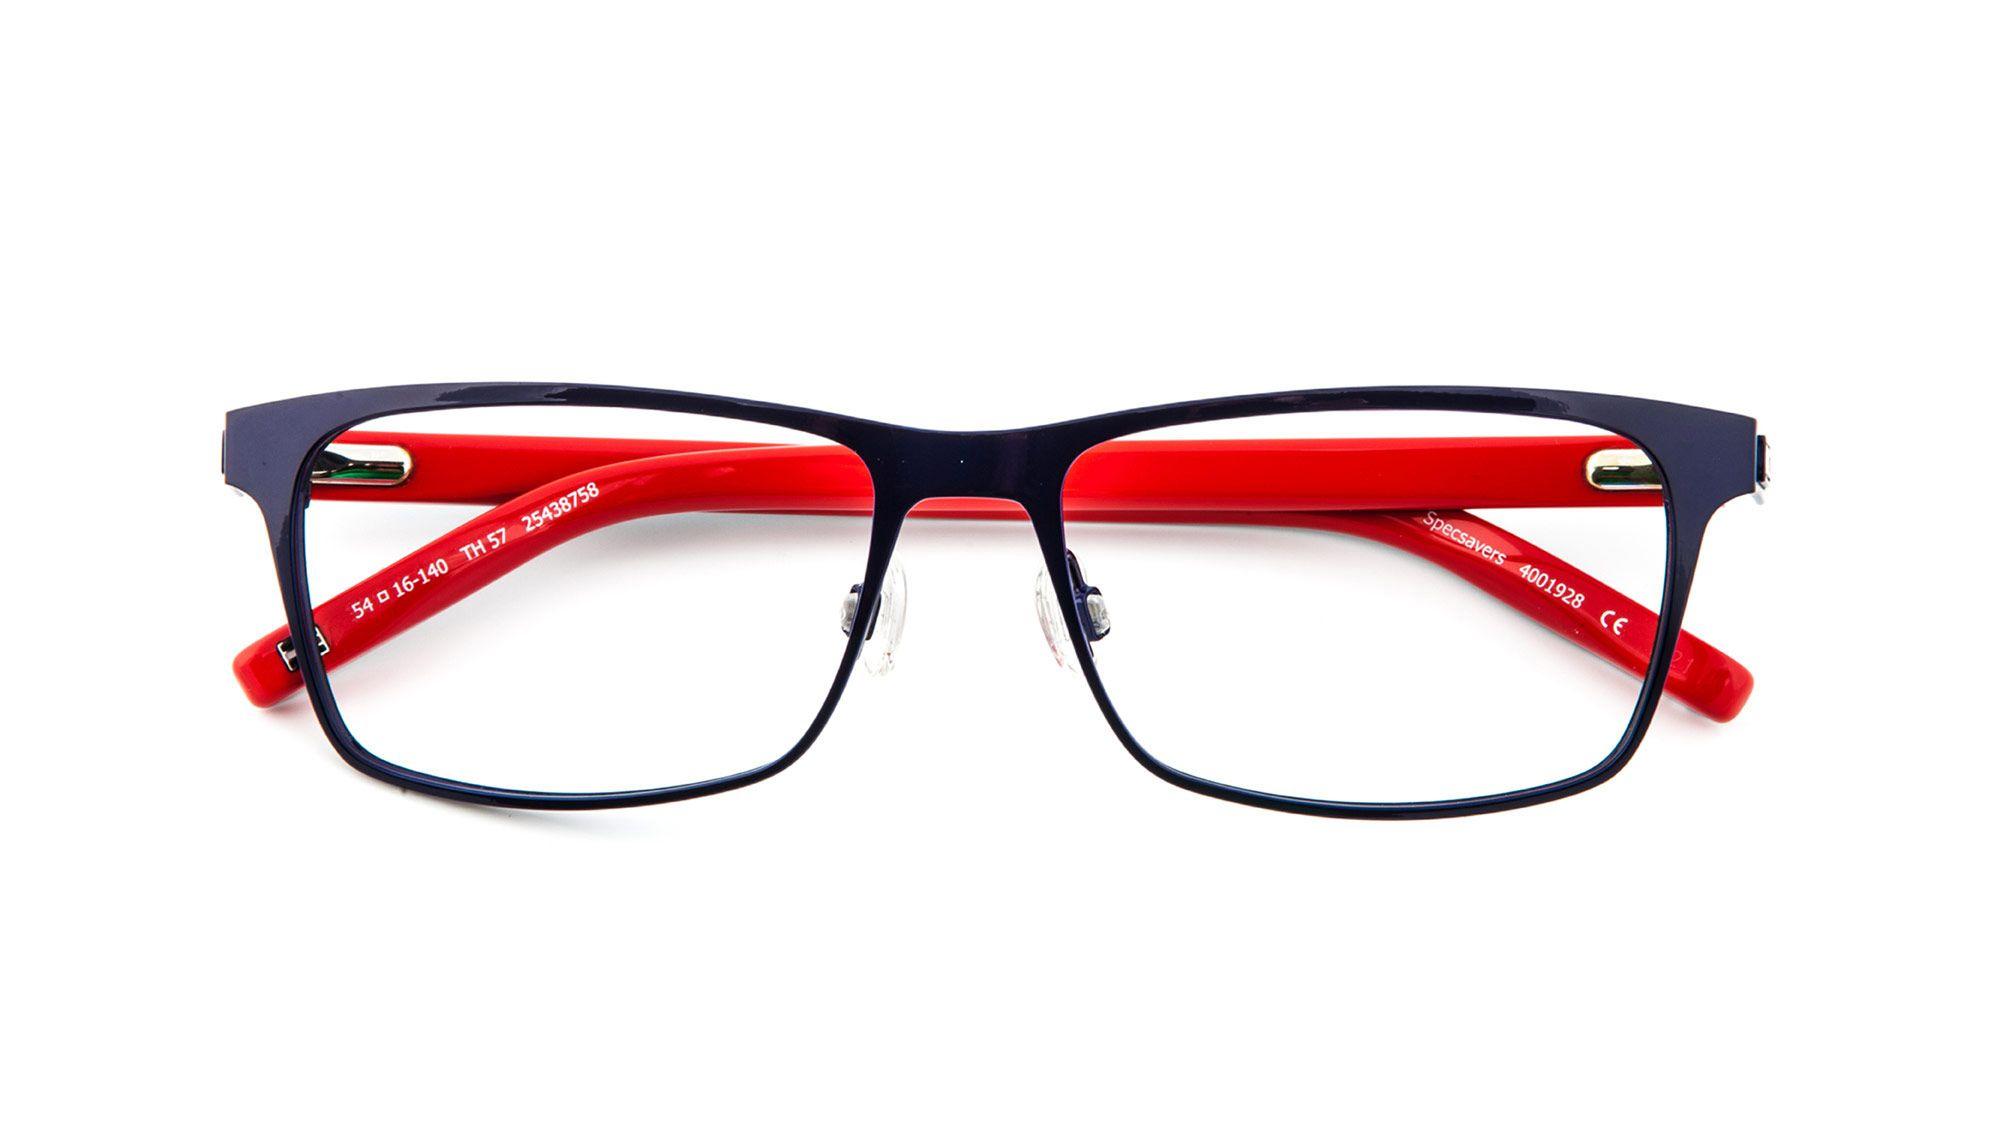 78f0210f11b TH 57 Glasses by Tommy Hilfiger